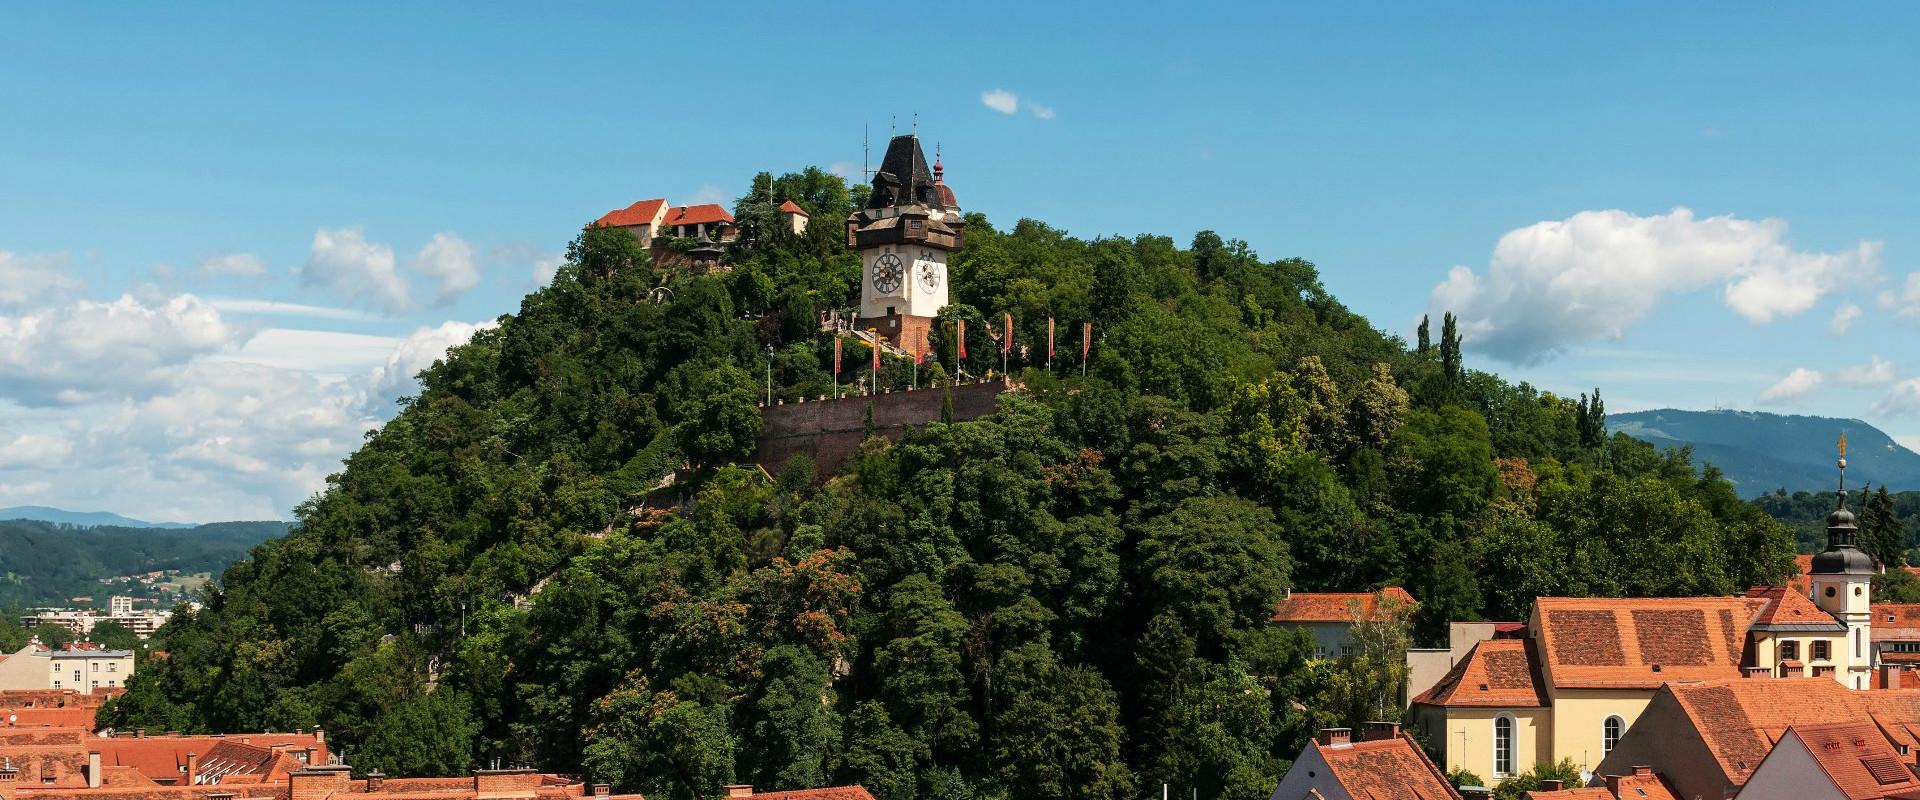 Blick auf den Schloßberg Graz